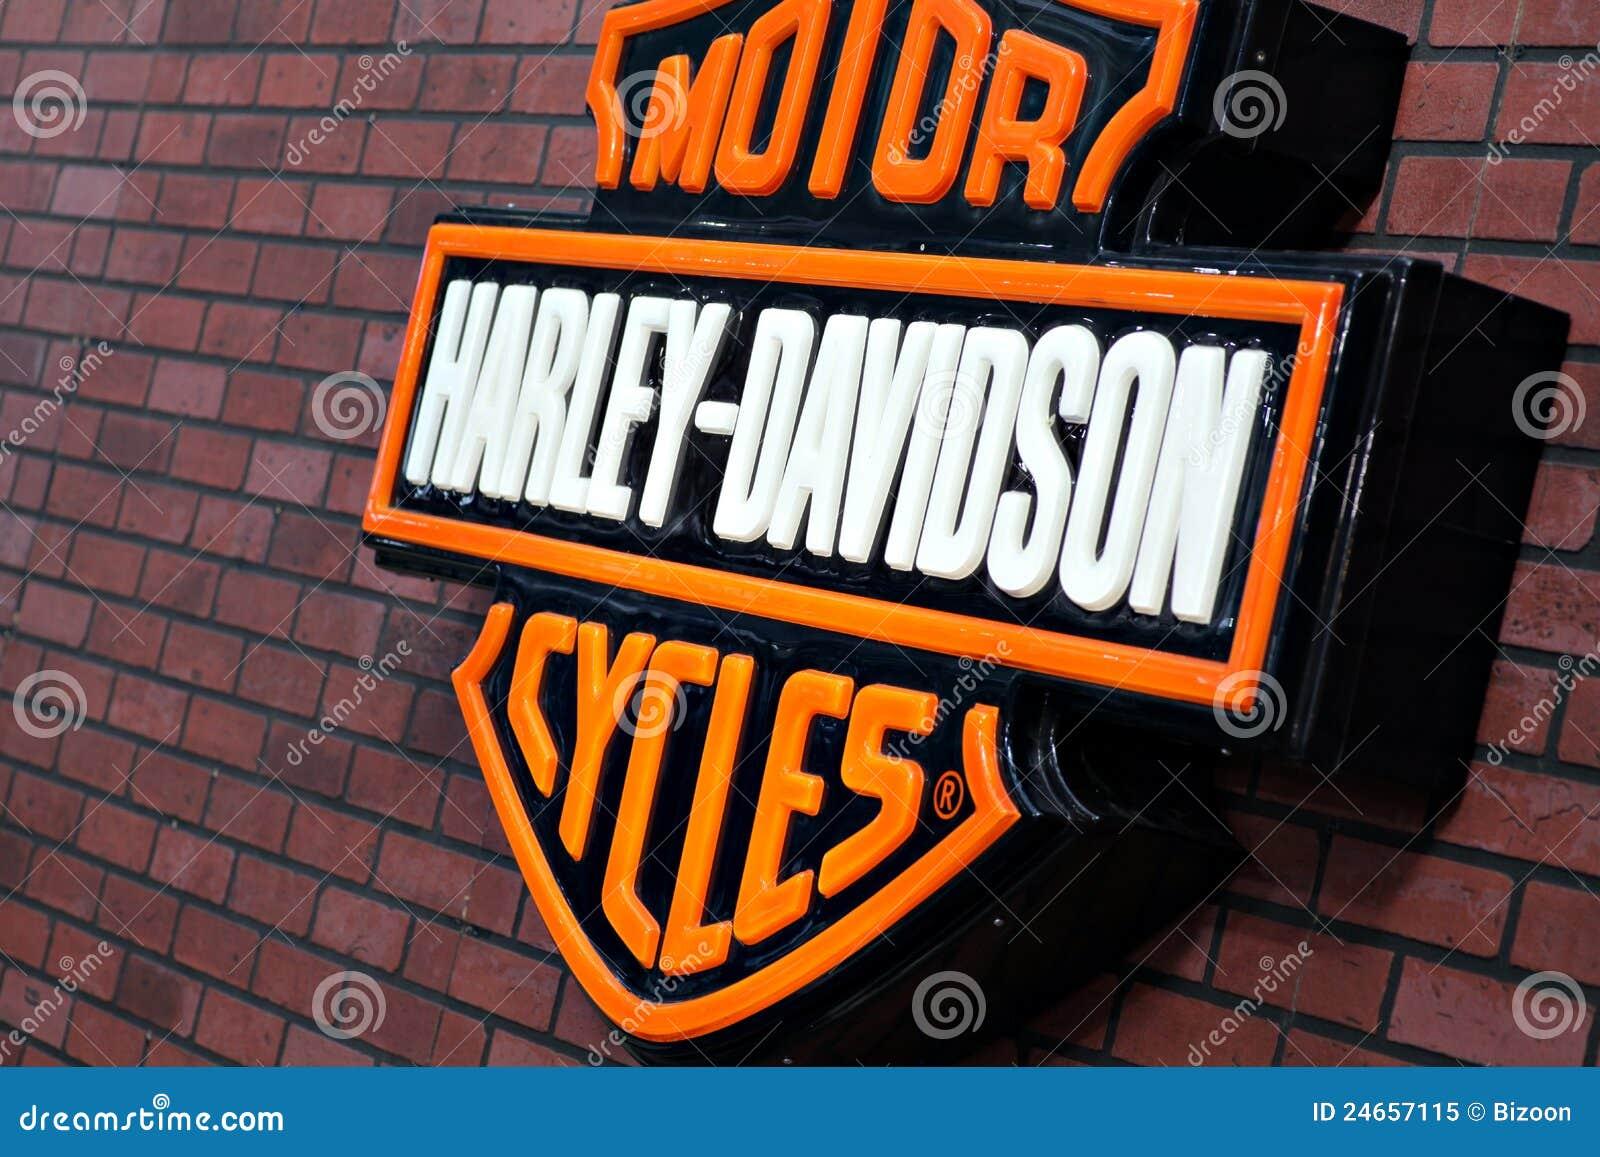 Harley Davidson Logo Editorial Image - Image: 24657115